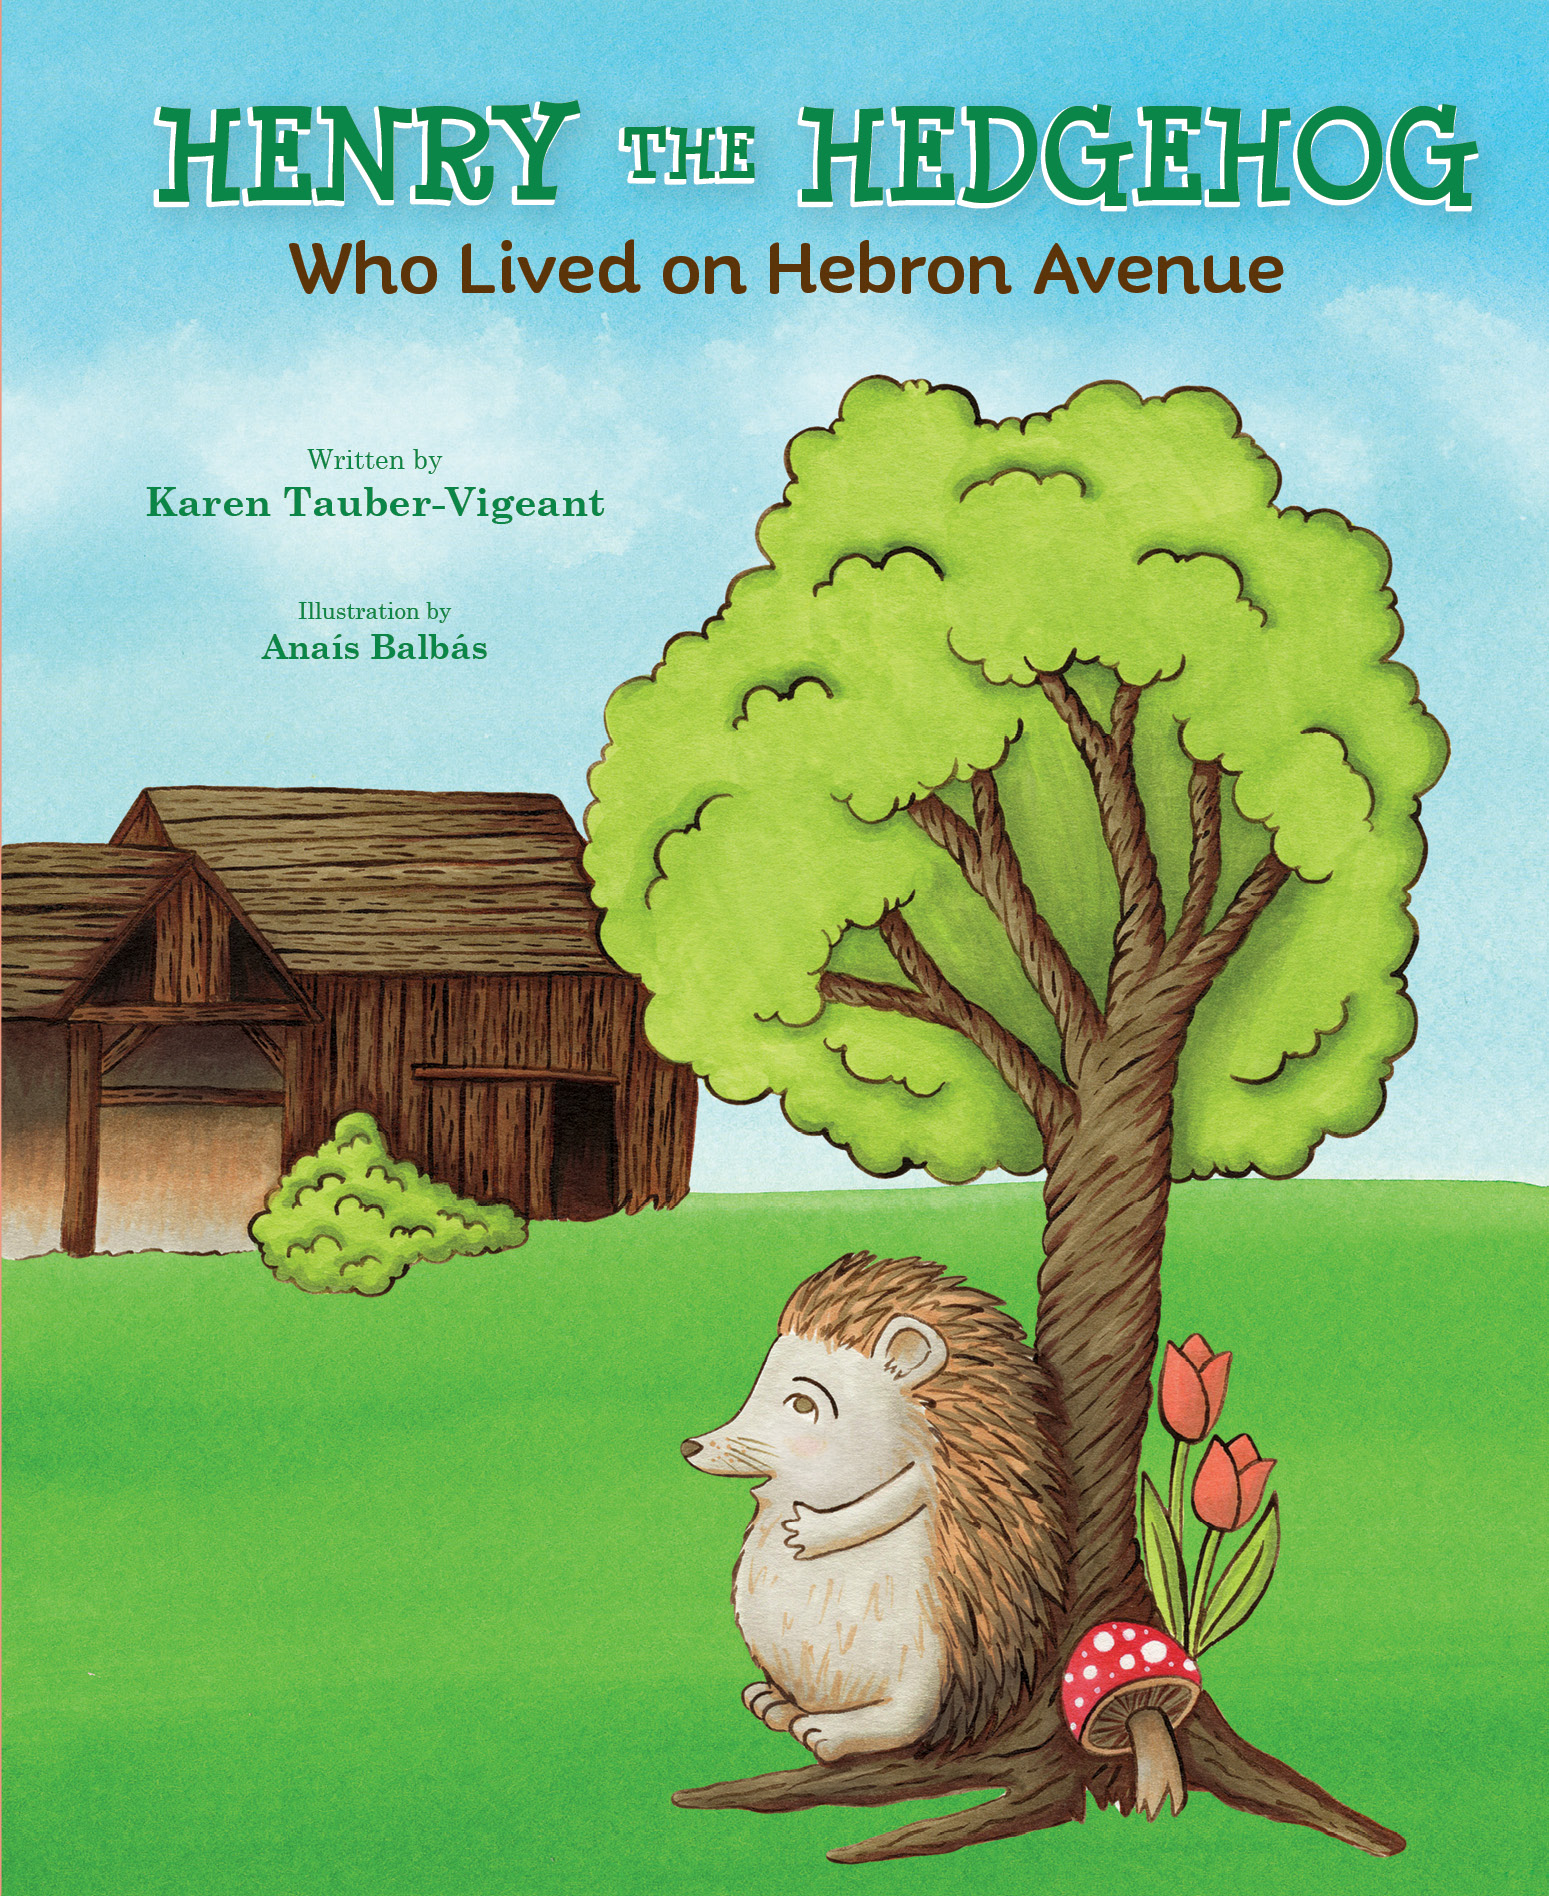 HenryTheHedgehog_Amazon